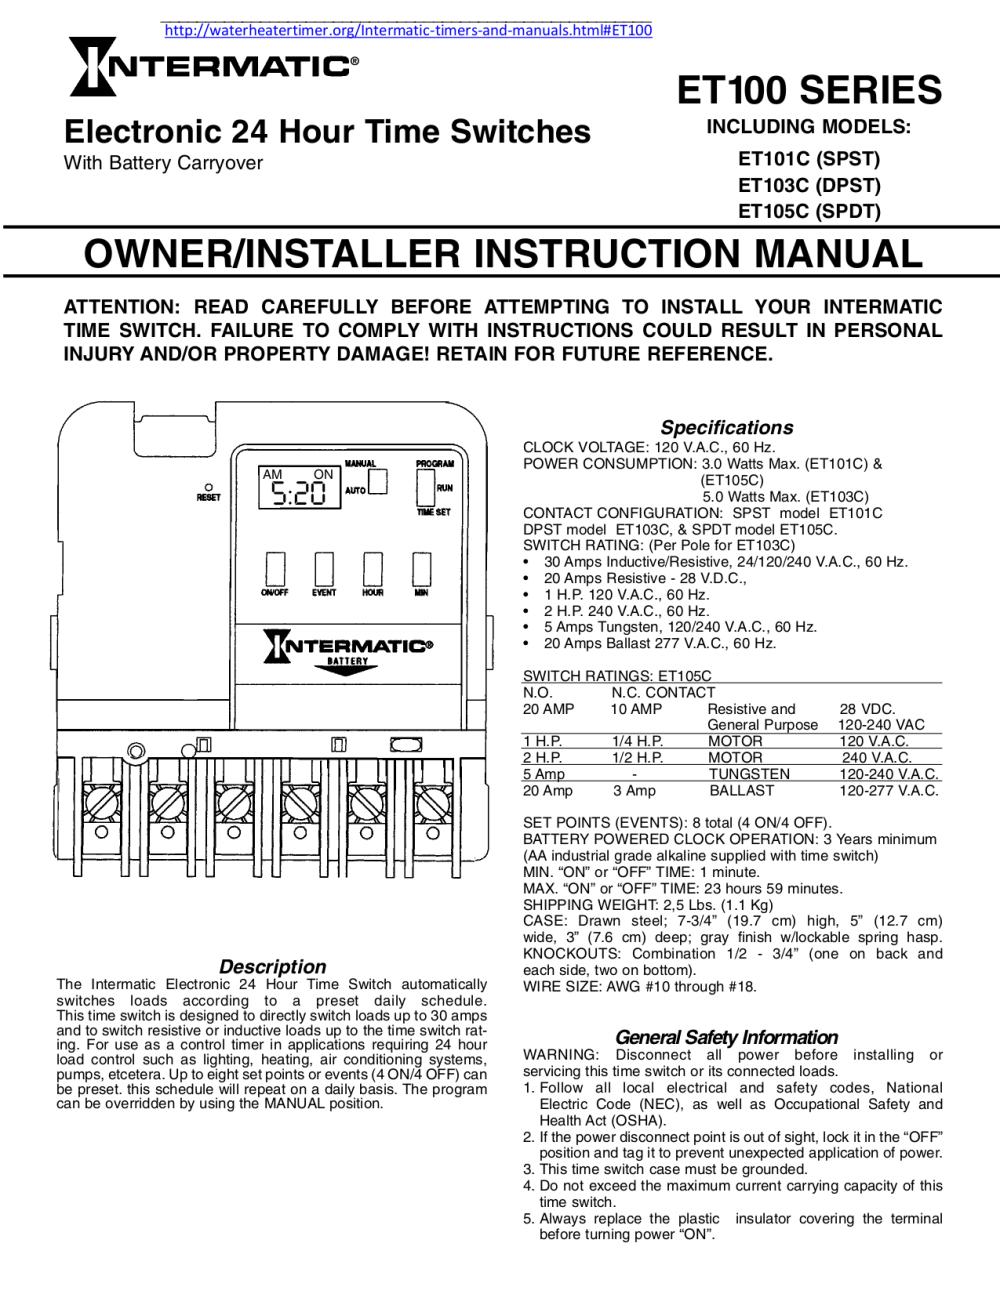 medium resolution of setting start end help call platt 800 257 4a midnight pst days intermatic intermatic time switch t101 manual t101 timer wiring diagram blazersdemoda